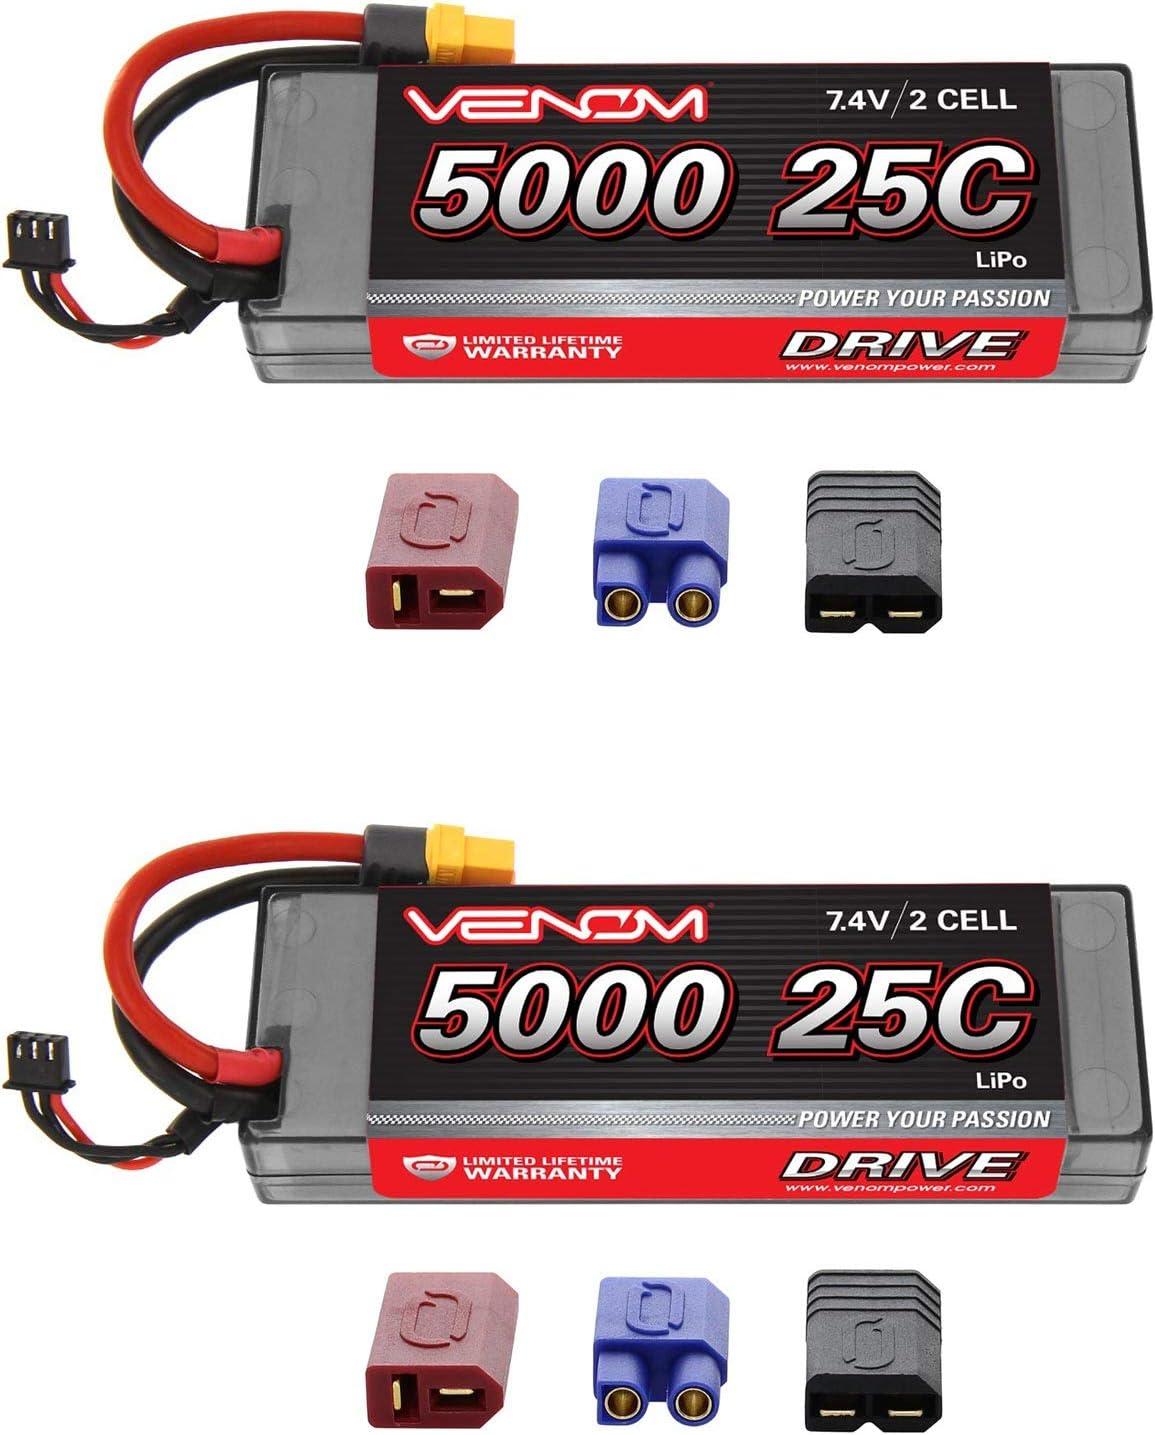 Traxxas Slash 1:10 20C 7.4V 5000mAh 2S with UNI Plug Venom LiPo Battery